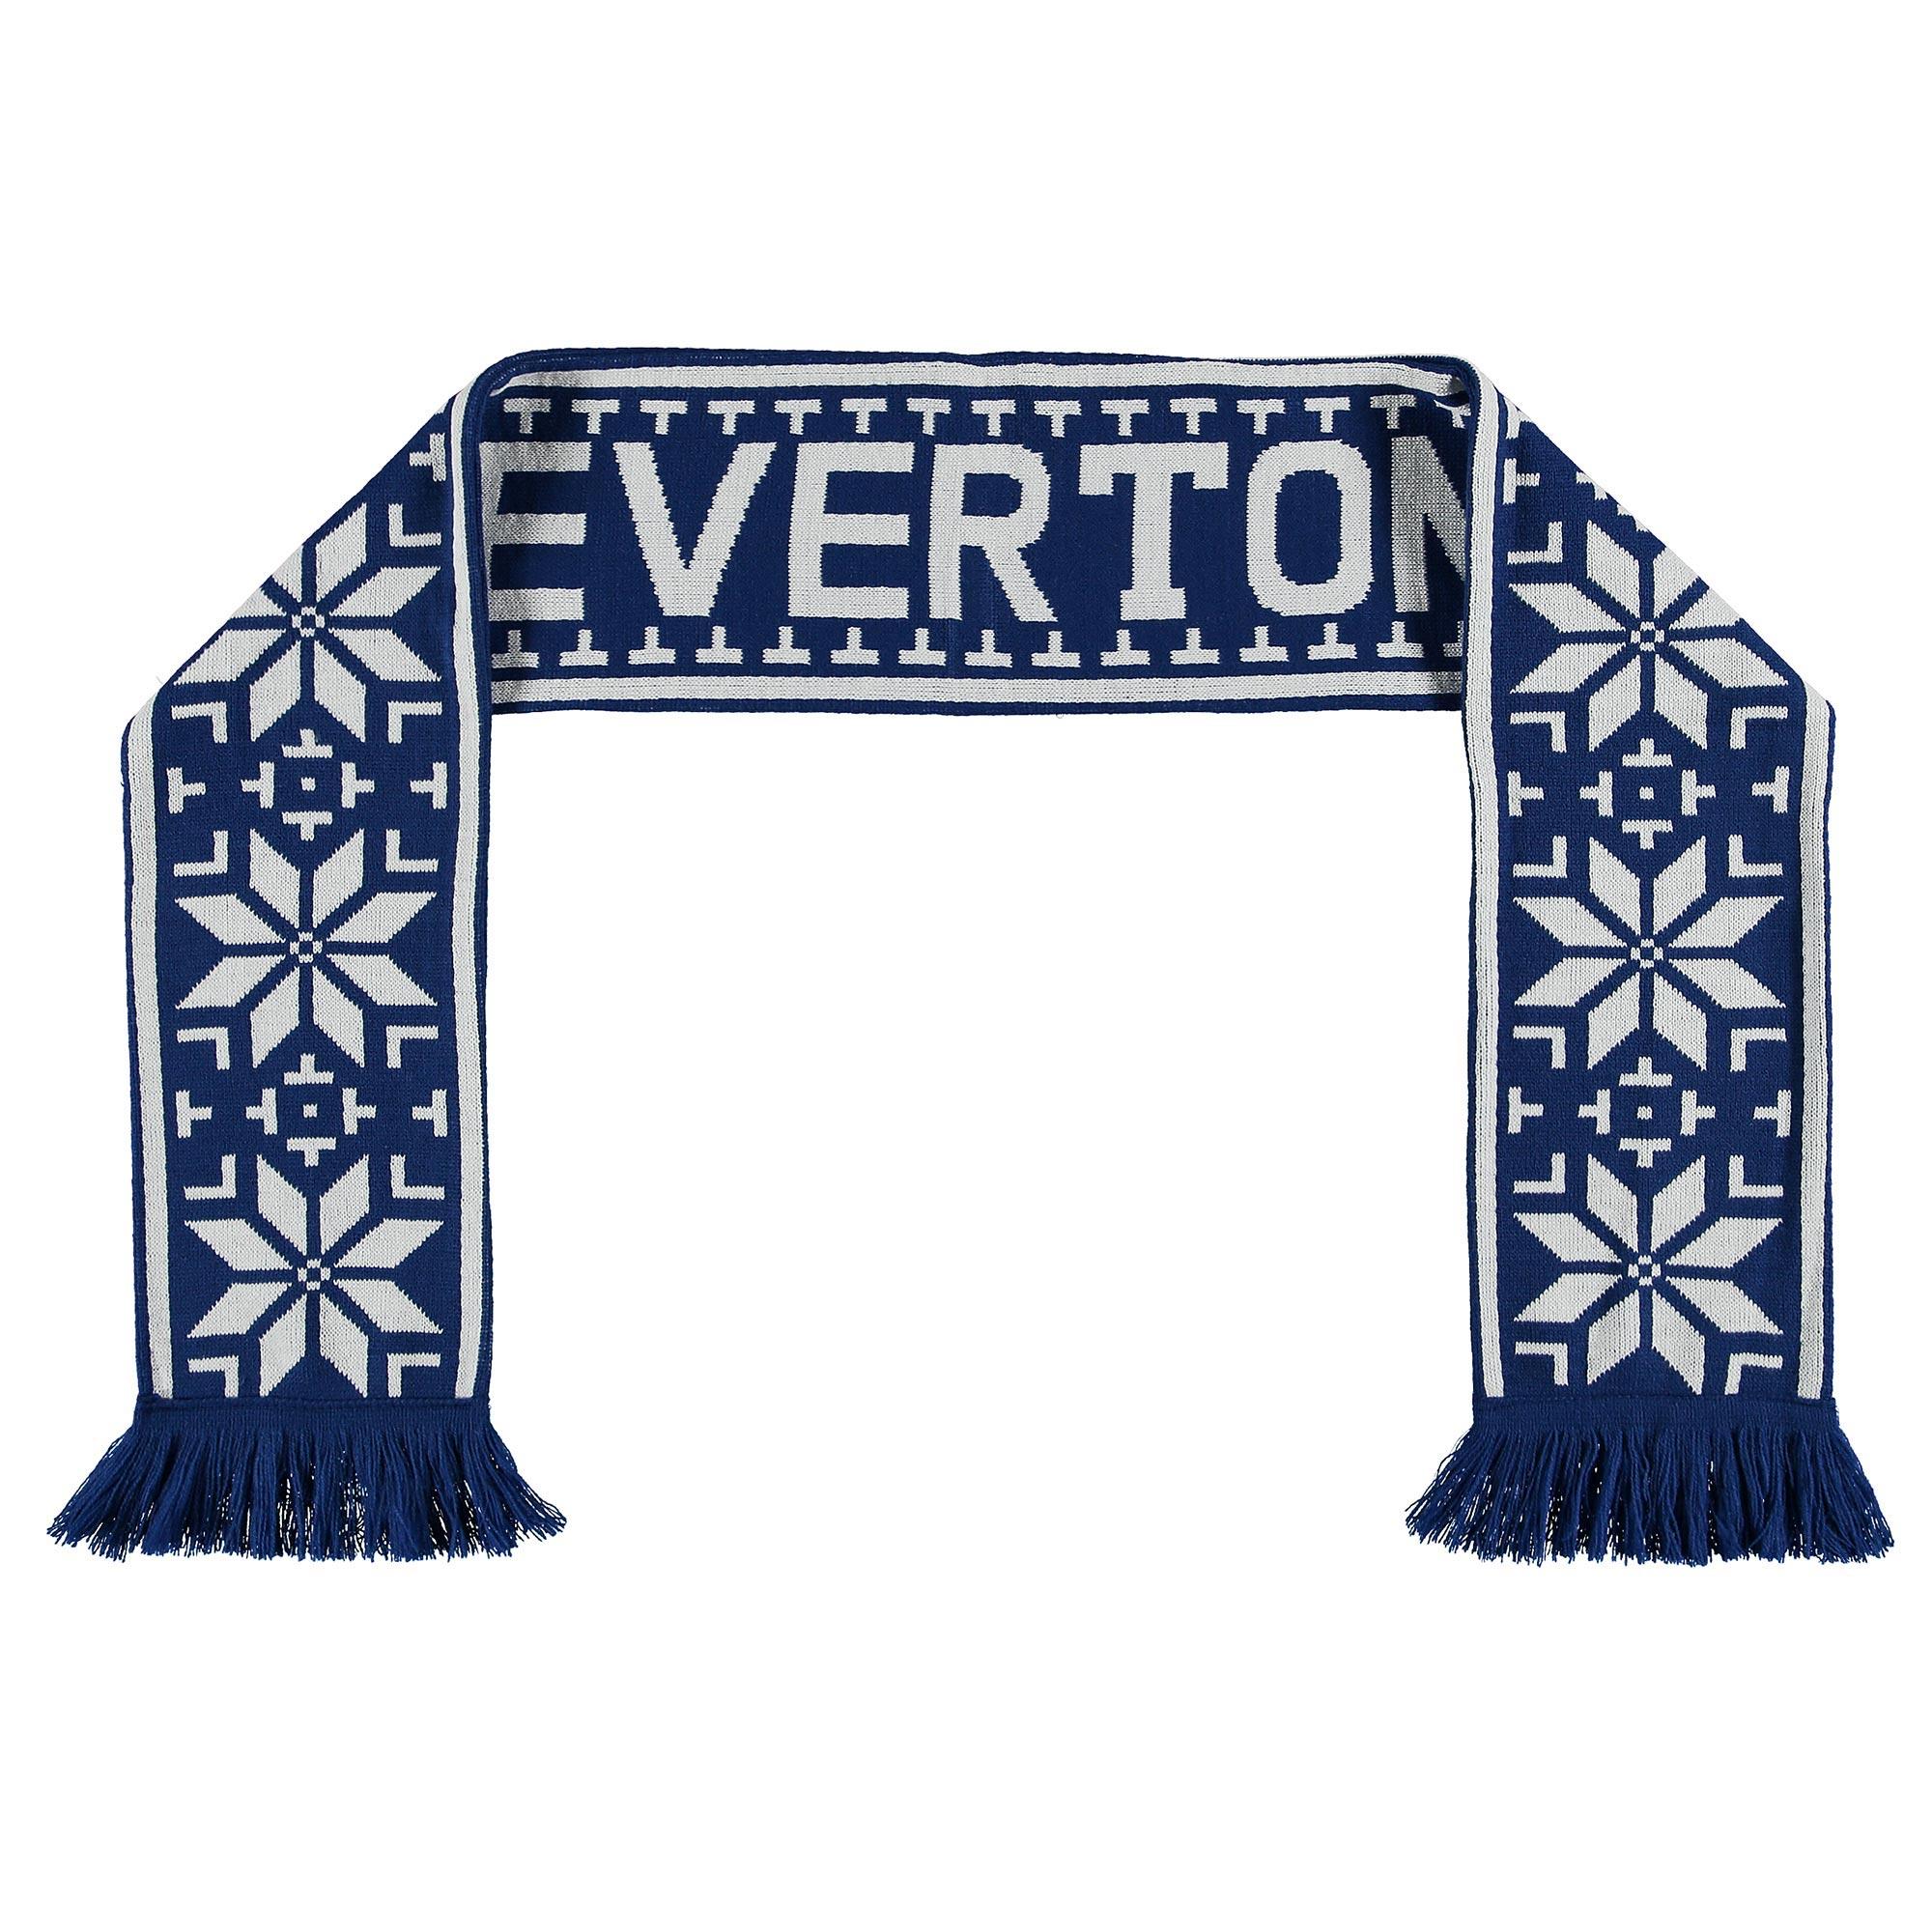 Everton FairIsle Scarf - Royal